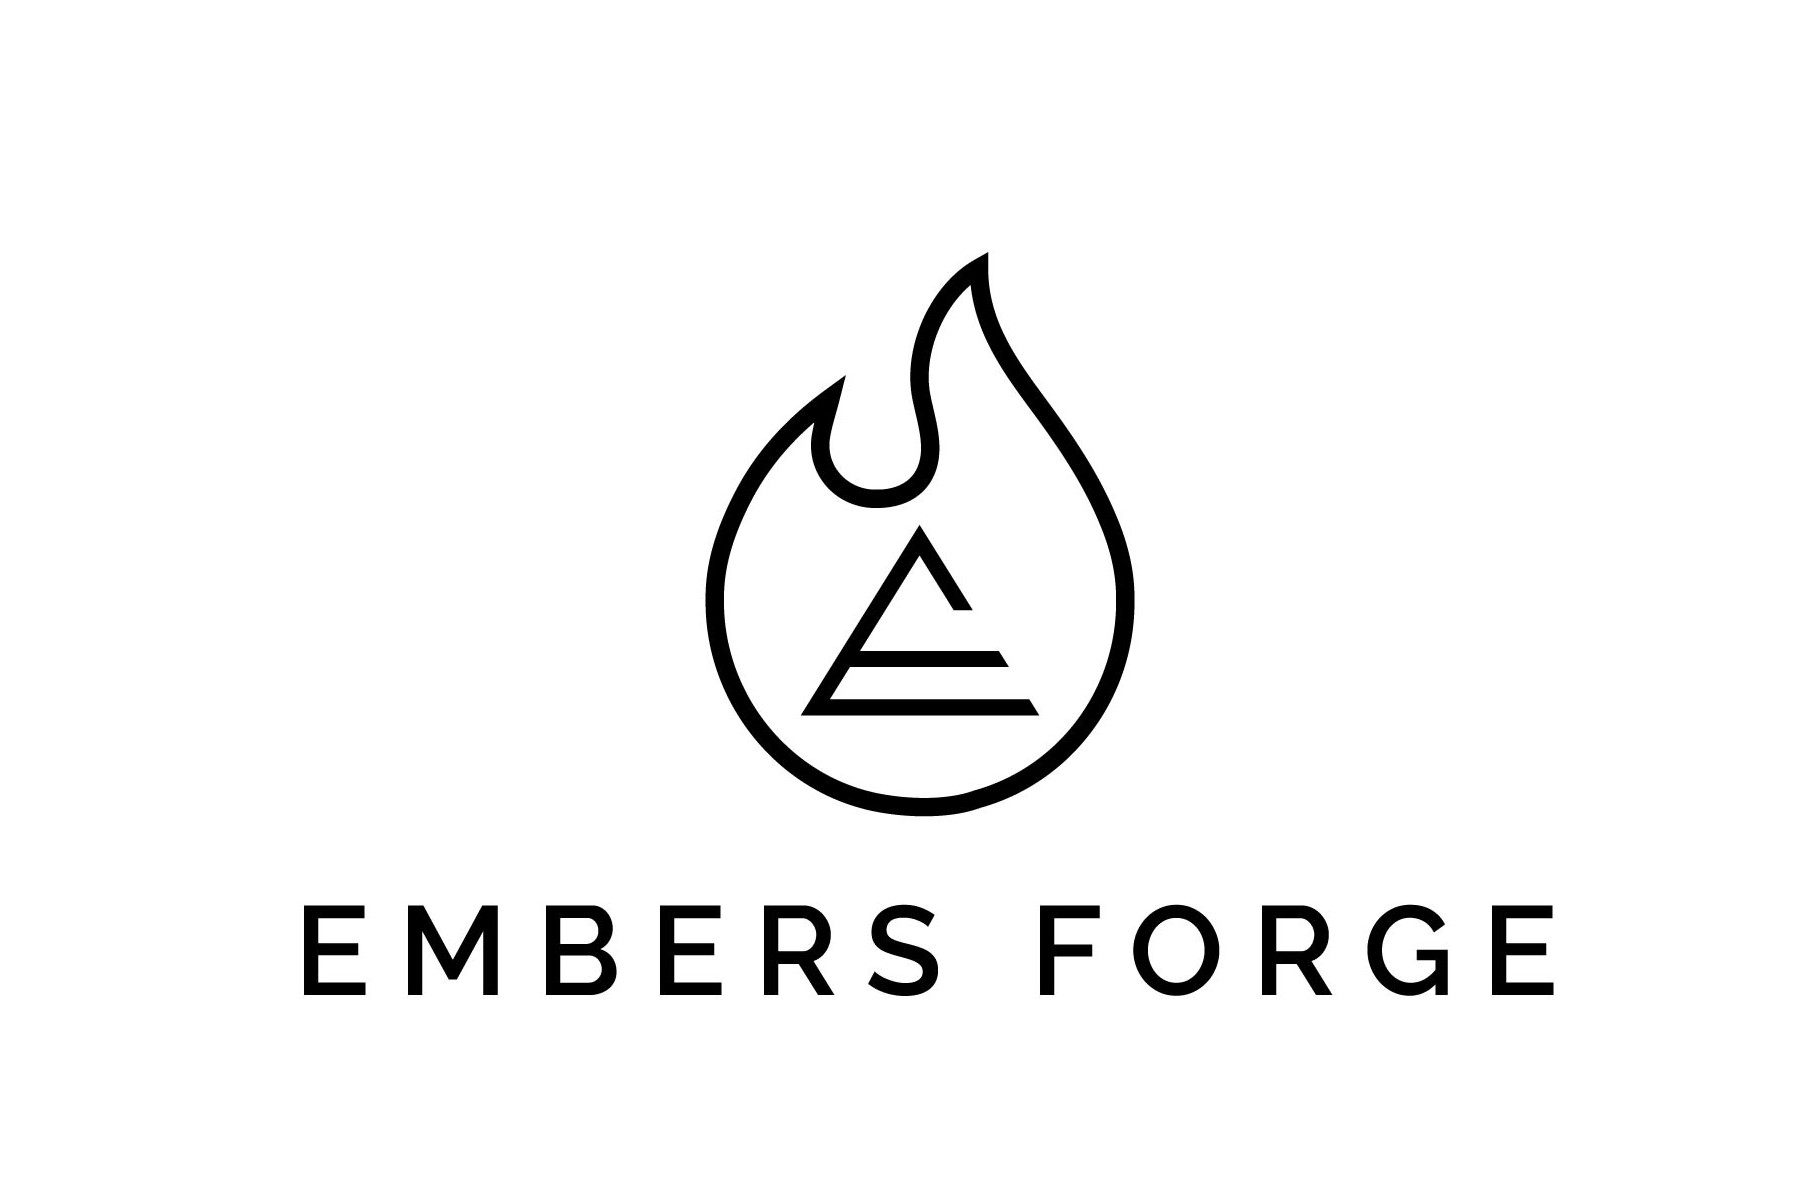 EMBERS FORGE